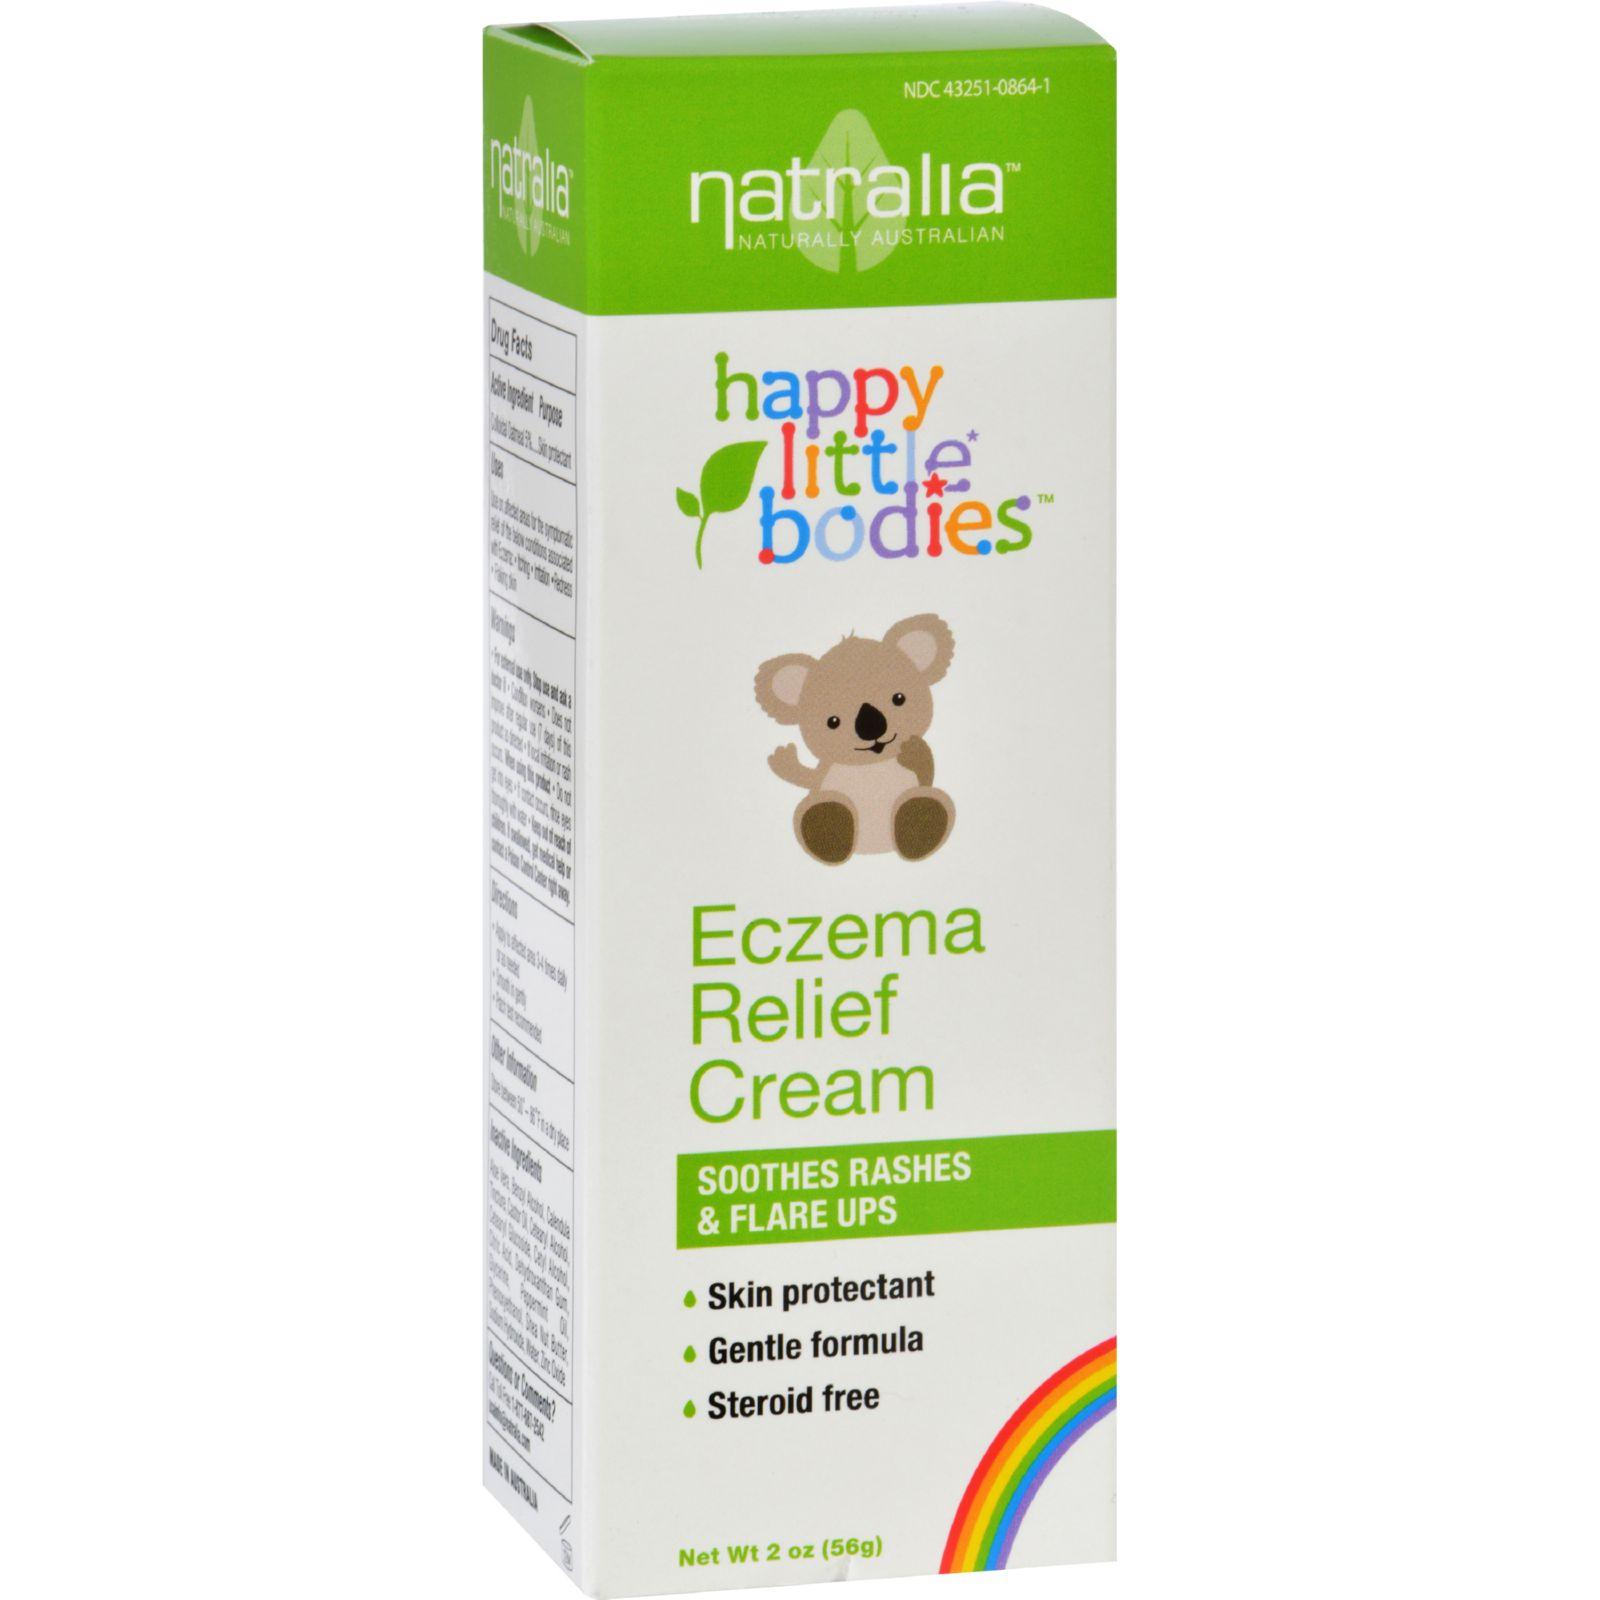 Happy Little Bodies Eczema Relief Cream - Natralia - 2 oz